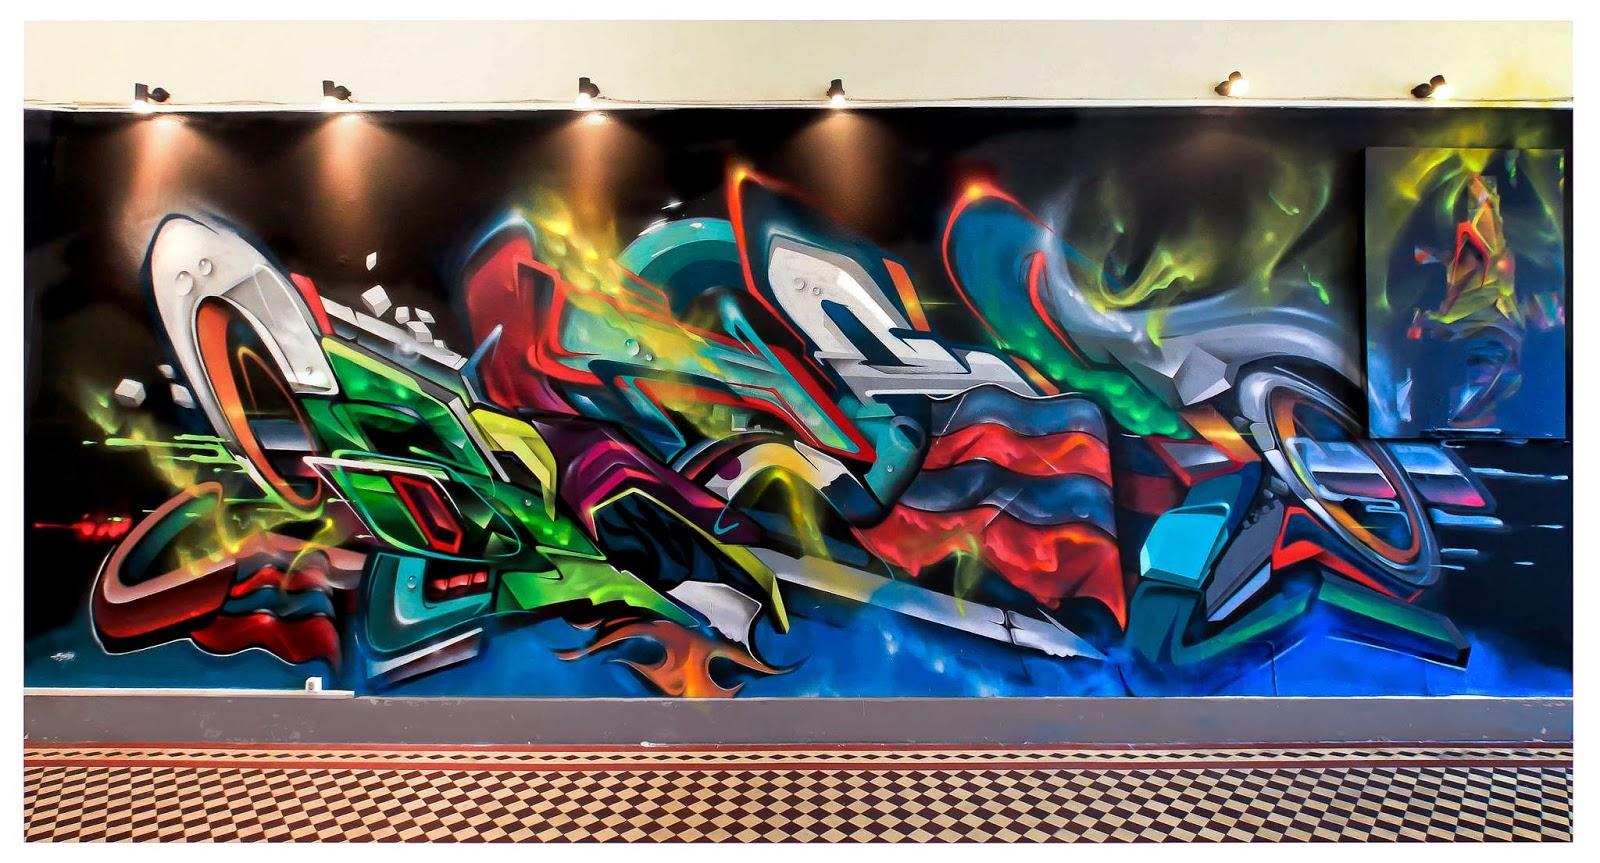 Bray graffiti from portugal